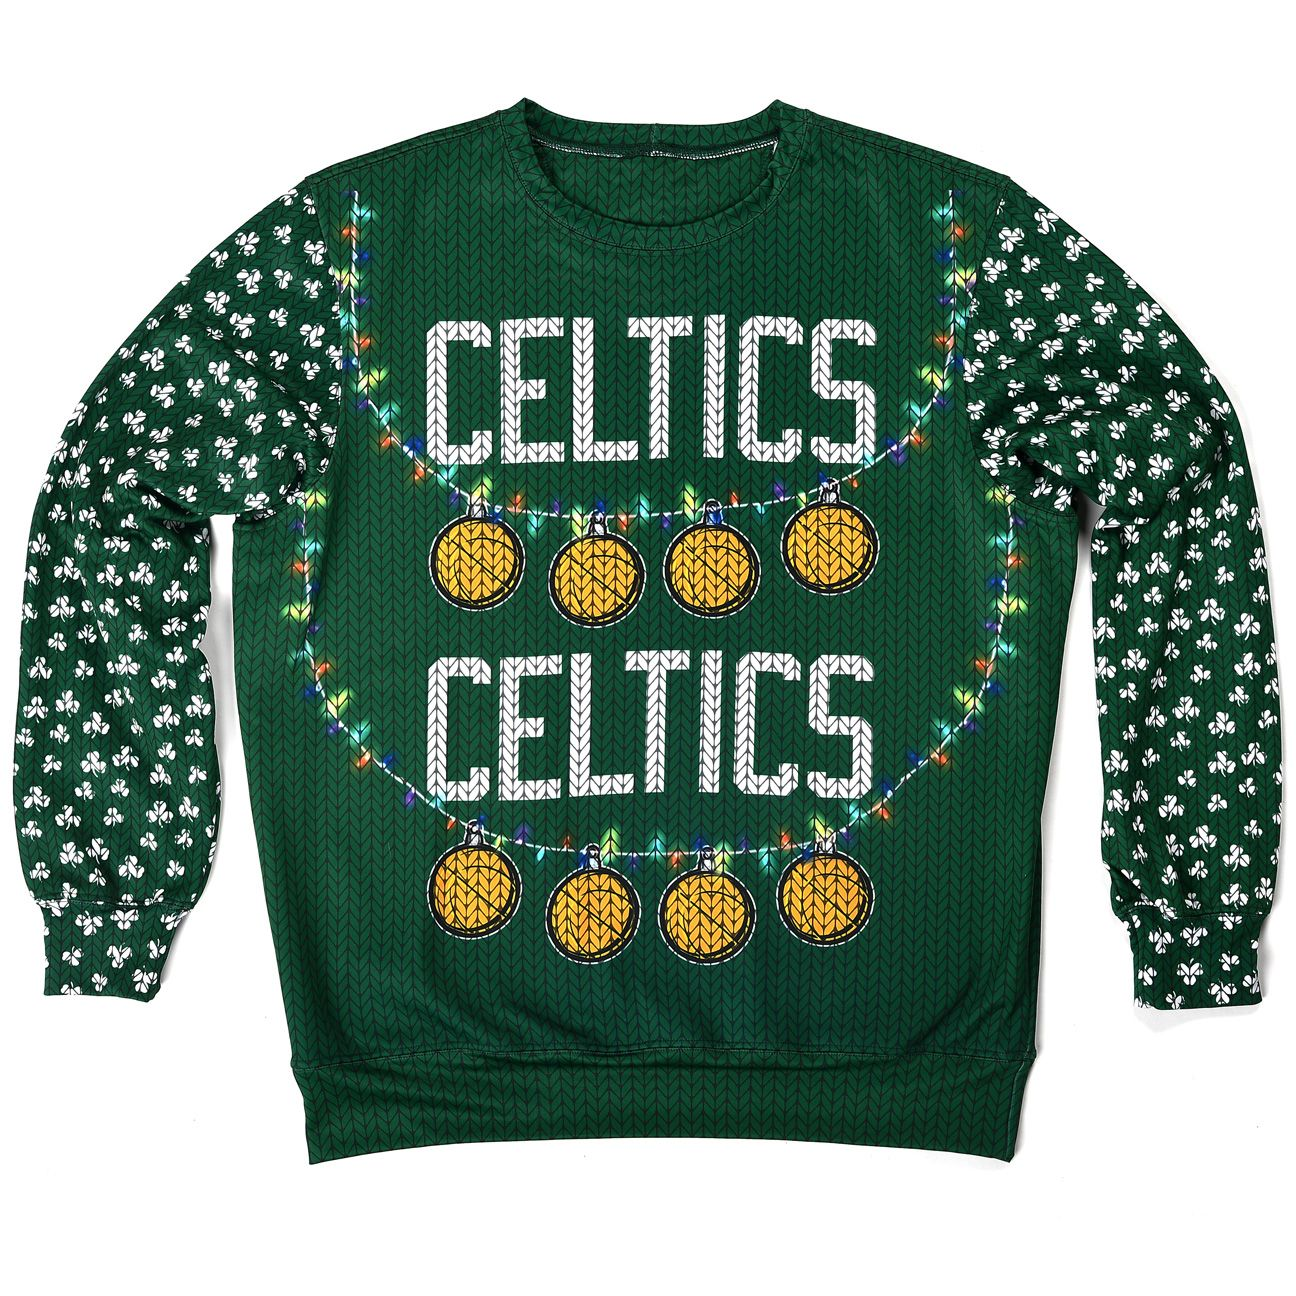 Celtics ugly sweater